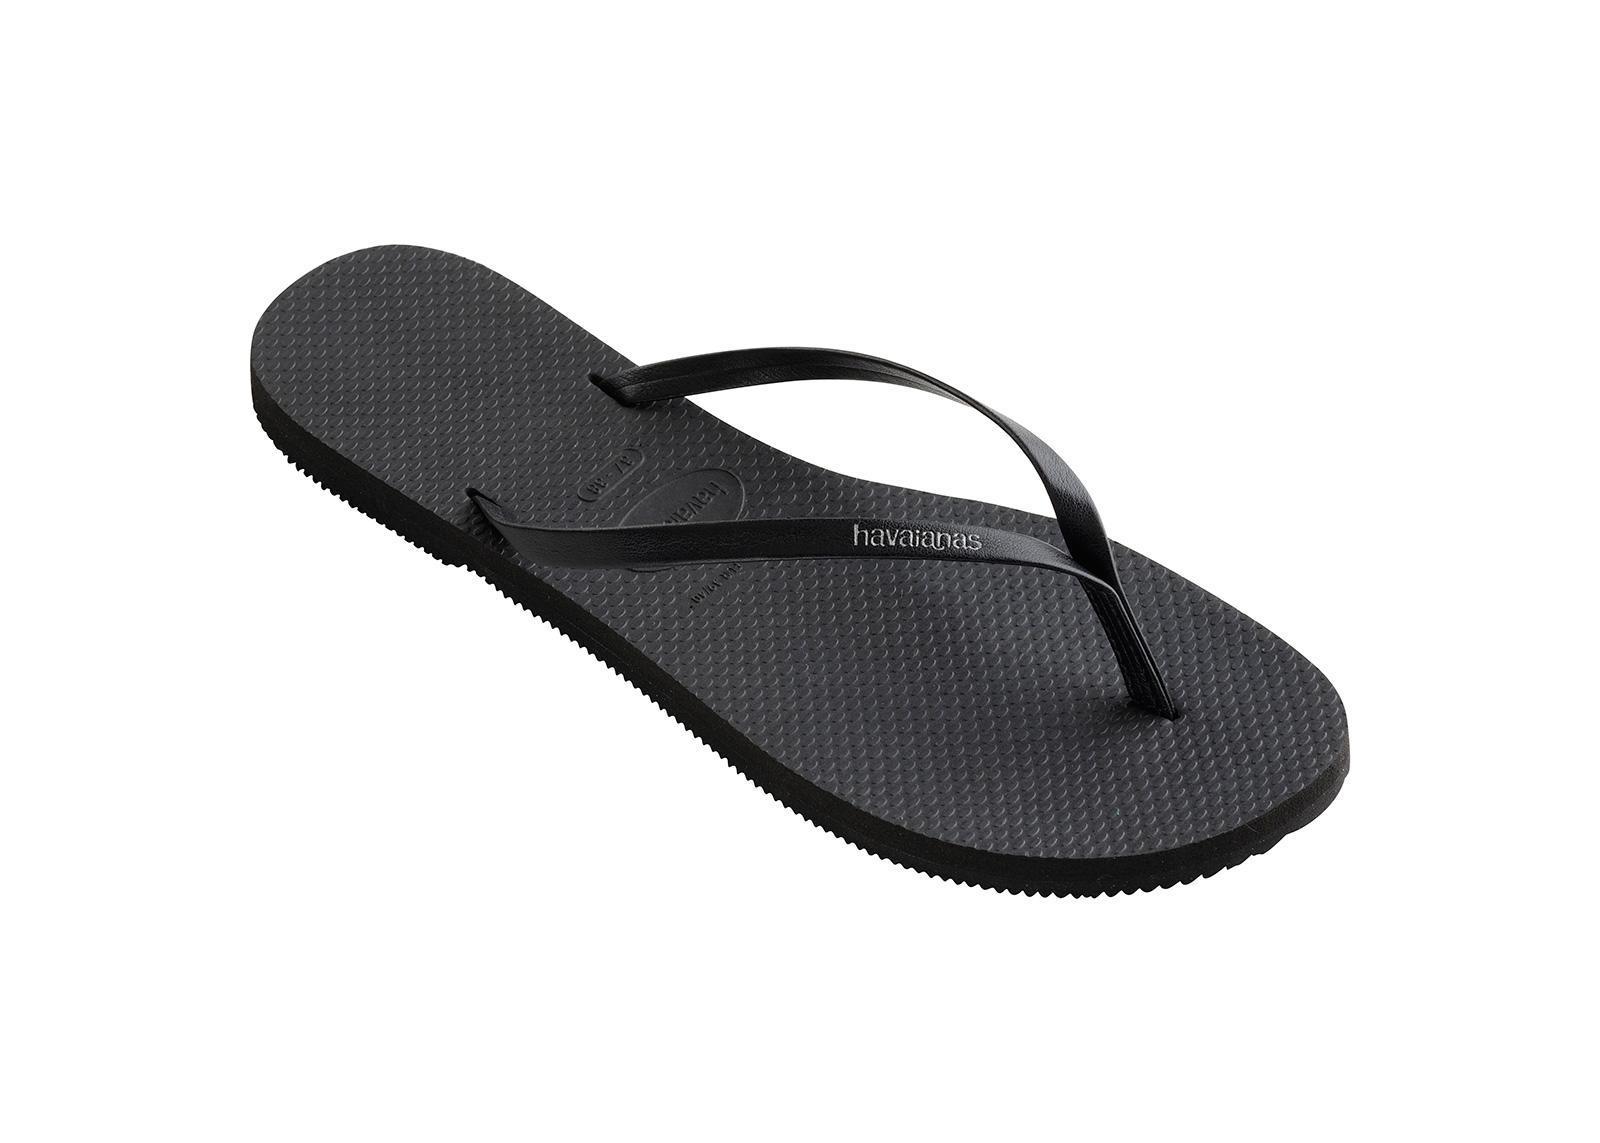 ed680e4cb Flip-Flops Black Flip Flops - Havaianas You Black - Brand Havaianas